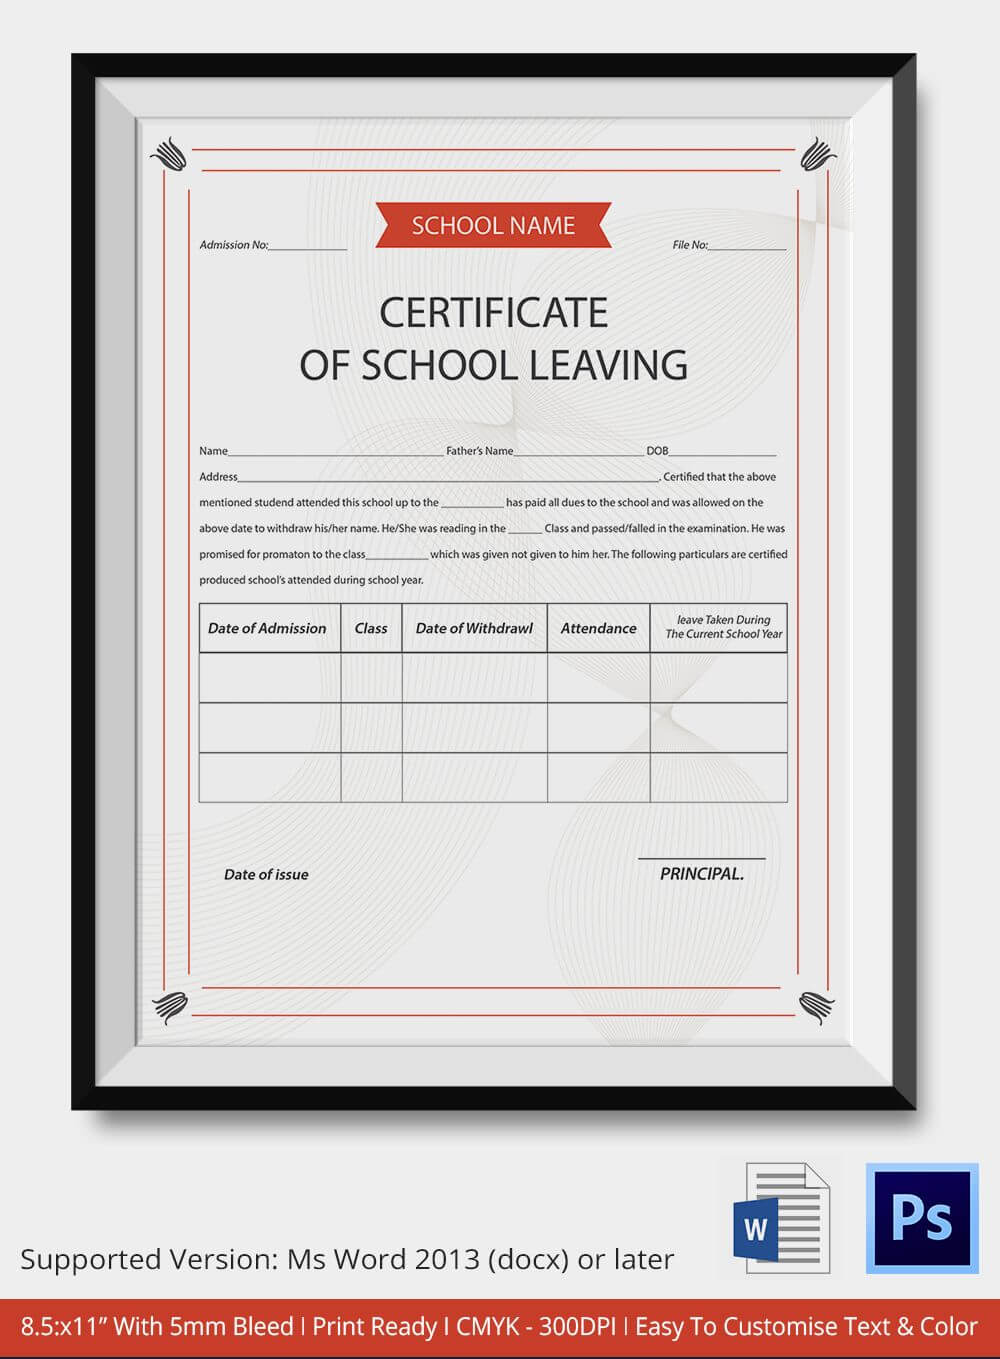 School Leaving Certificate Template | Certificate Templates In School Leaving Certificate Template